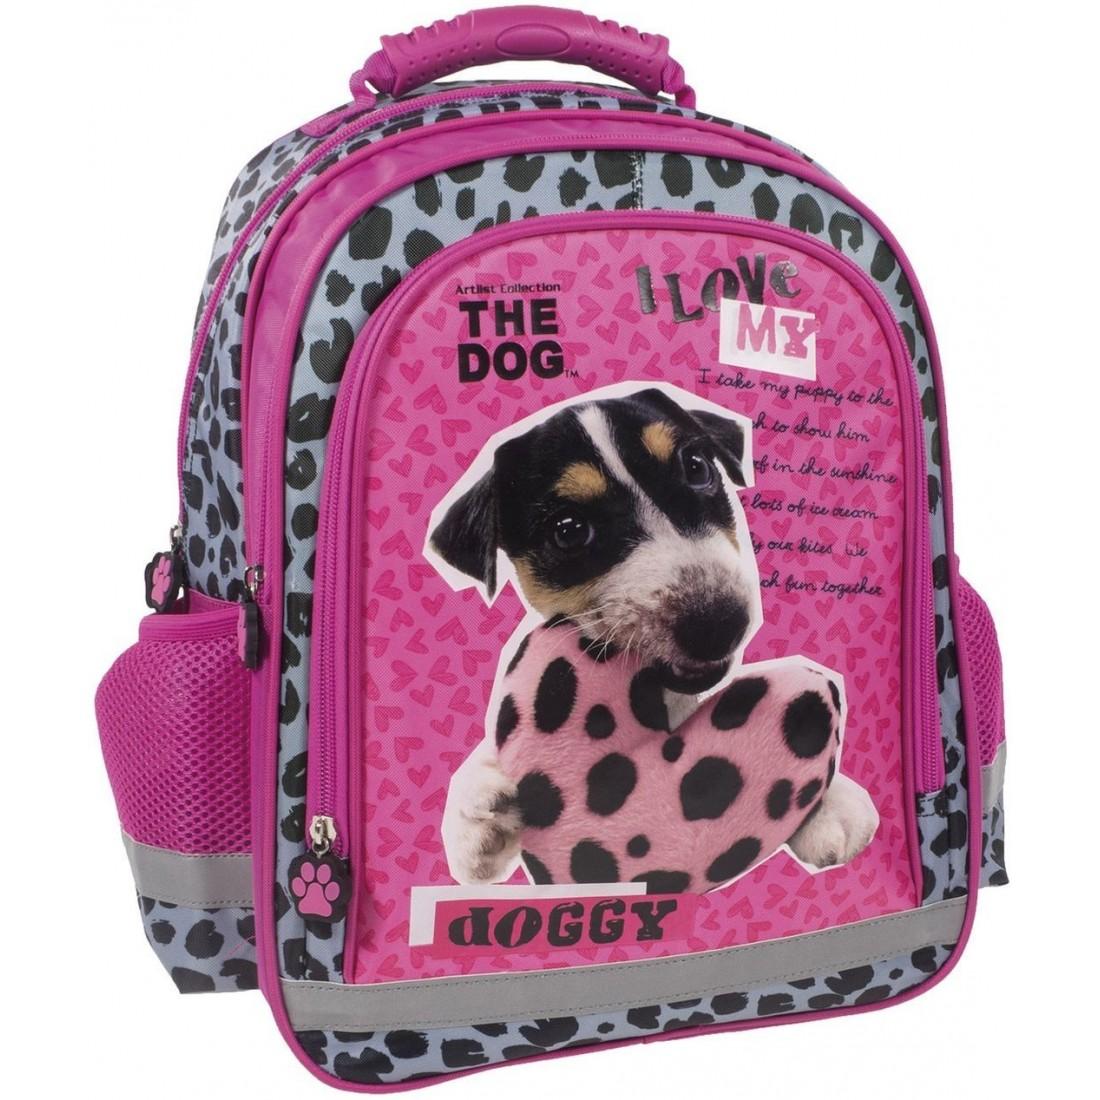 2503ee8db5d64 Plecak THE DOG szkolny w łaty PIES Z SERCEM - plecak-tornister.pl